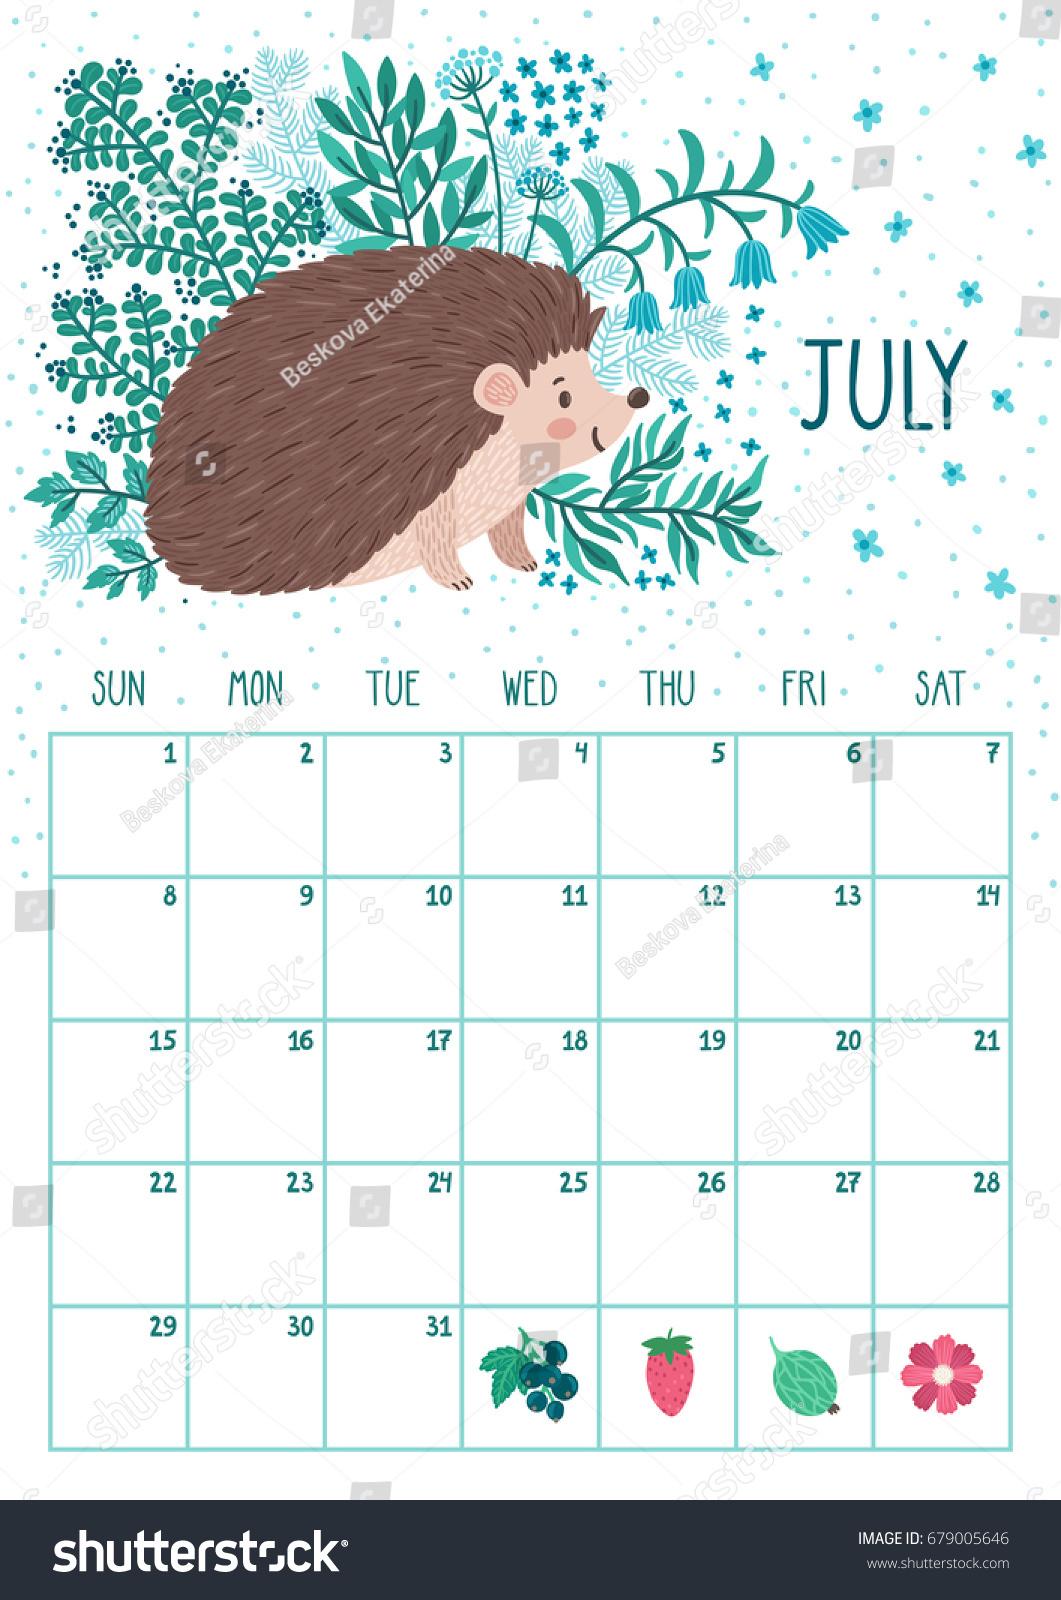 calendar template july 2018 Madrat.co